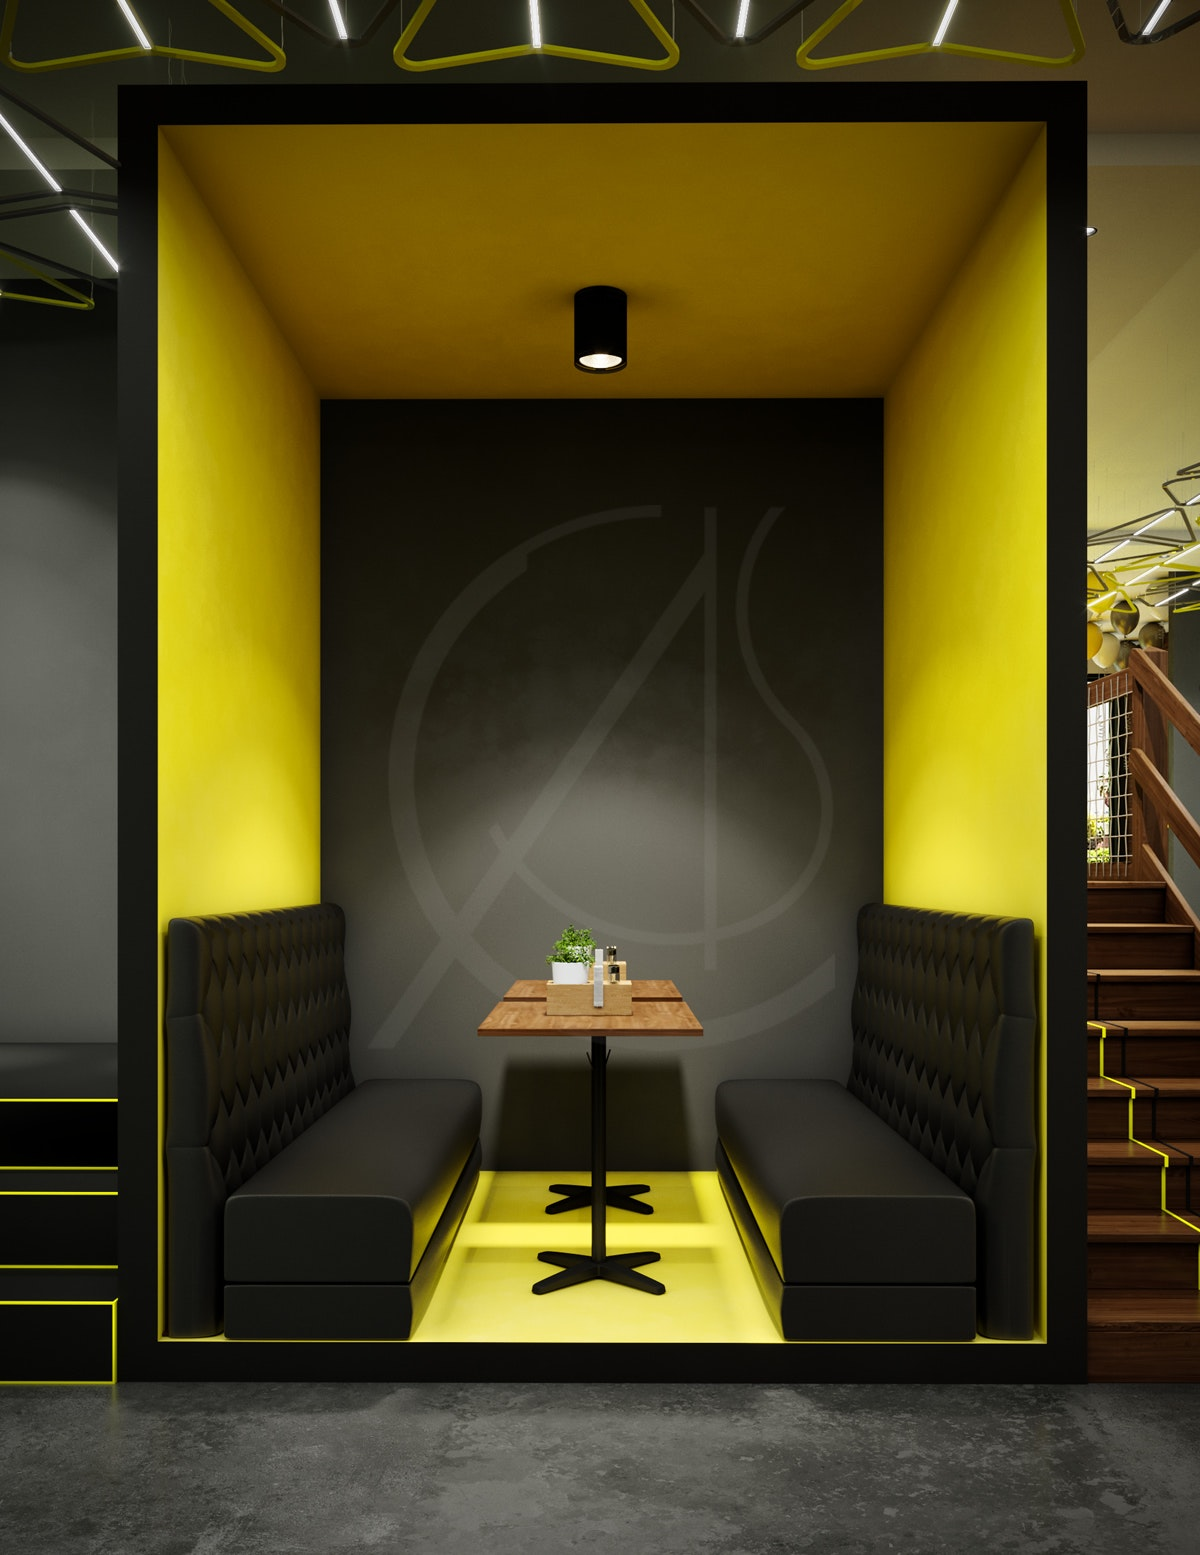 Modern Fast Food Restaurant Interior Design By Comelite Architecture Structure And Interior Design Architizer